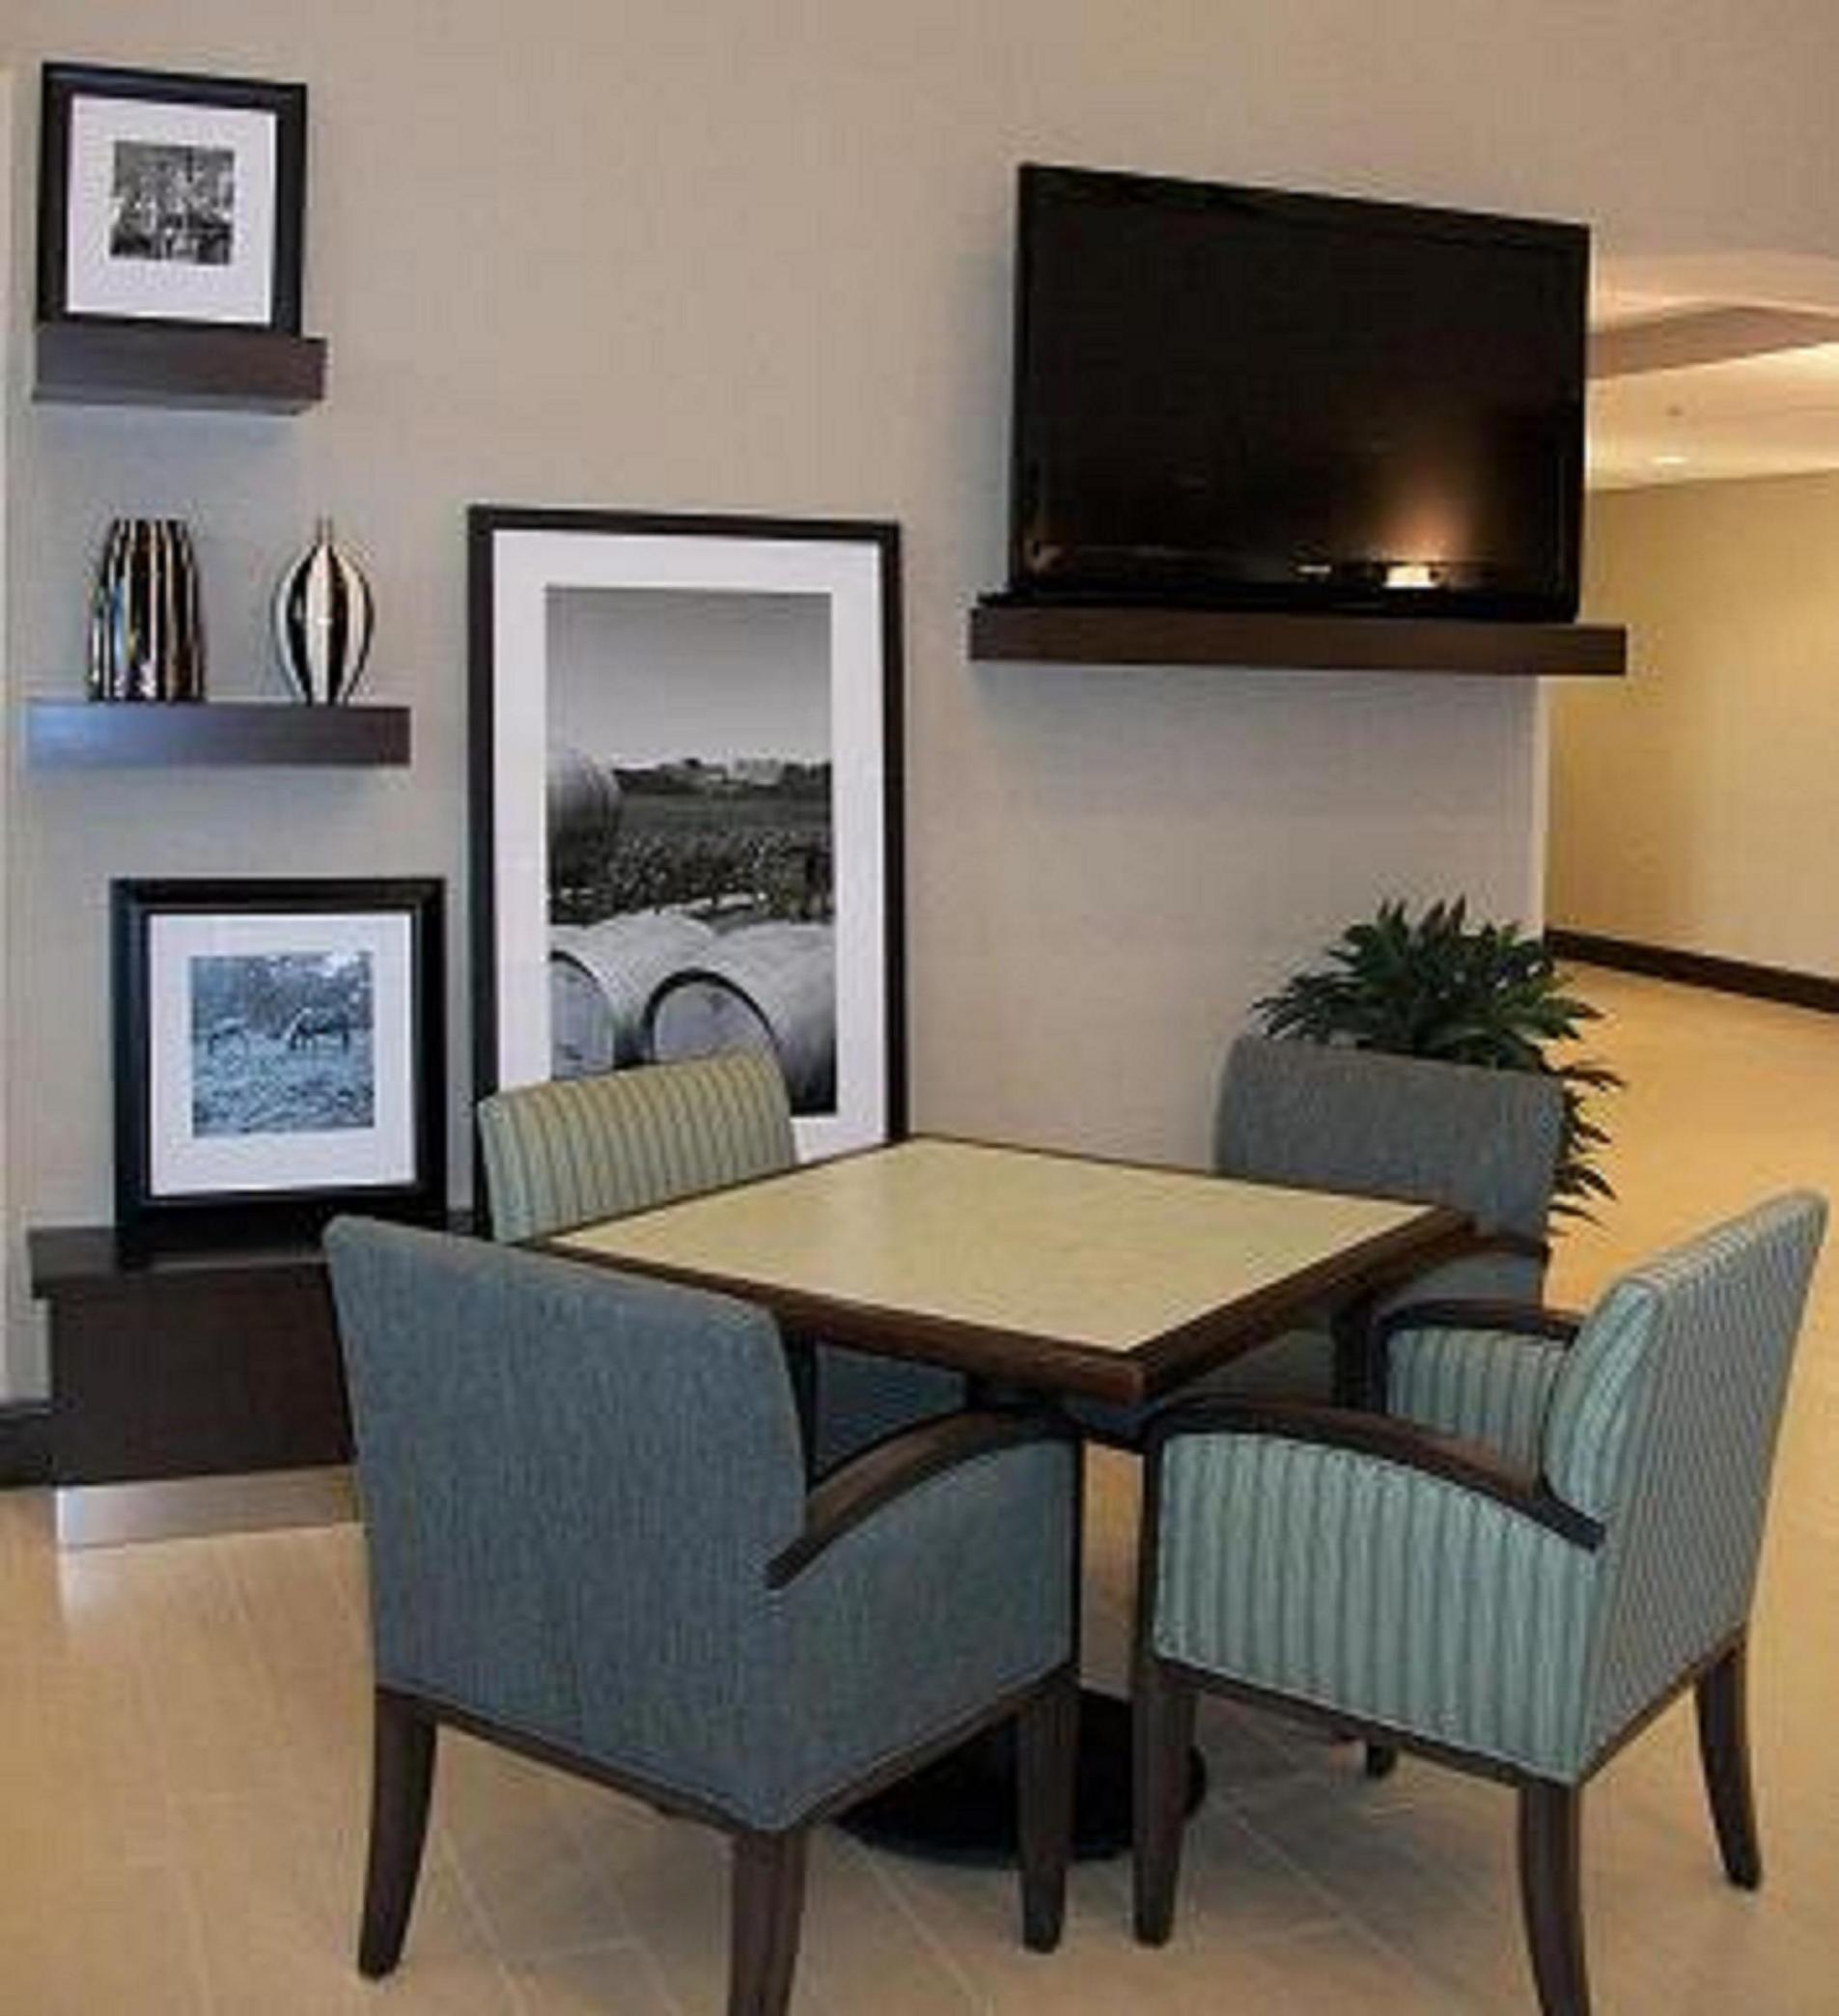 Hampton Inn & Suites Manteca image 4